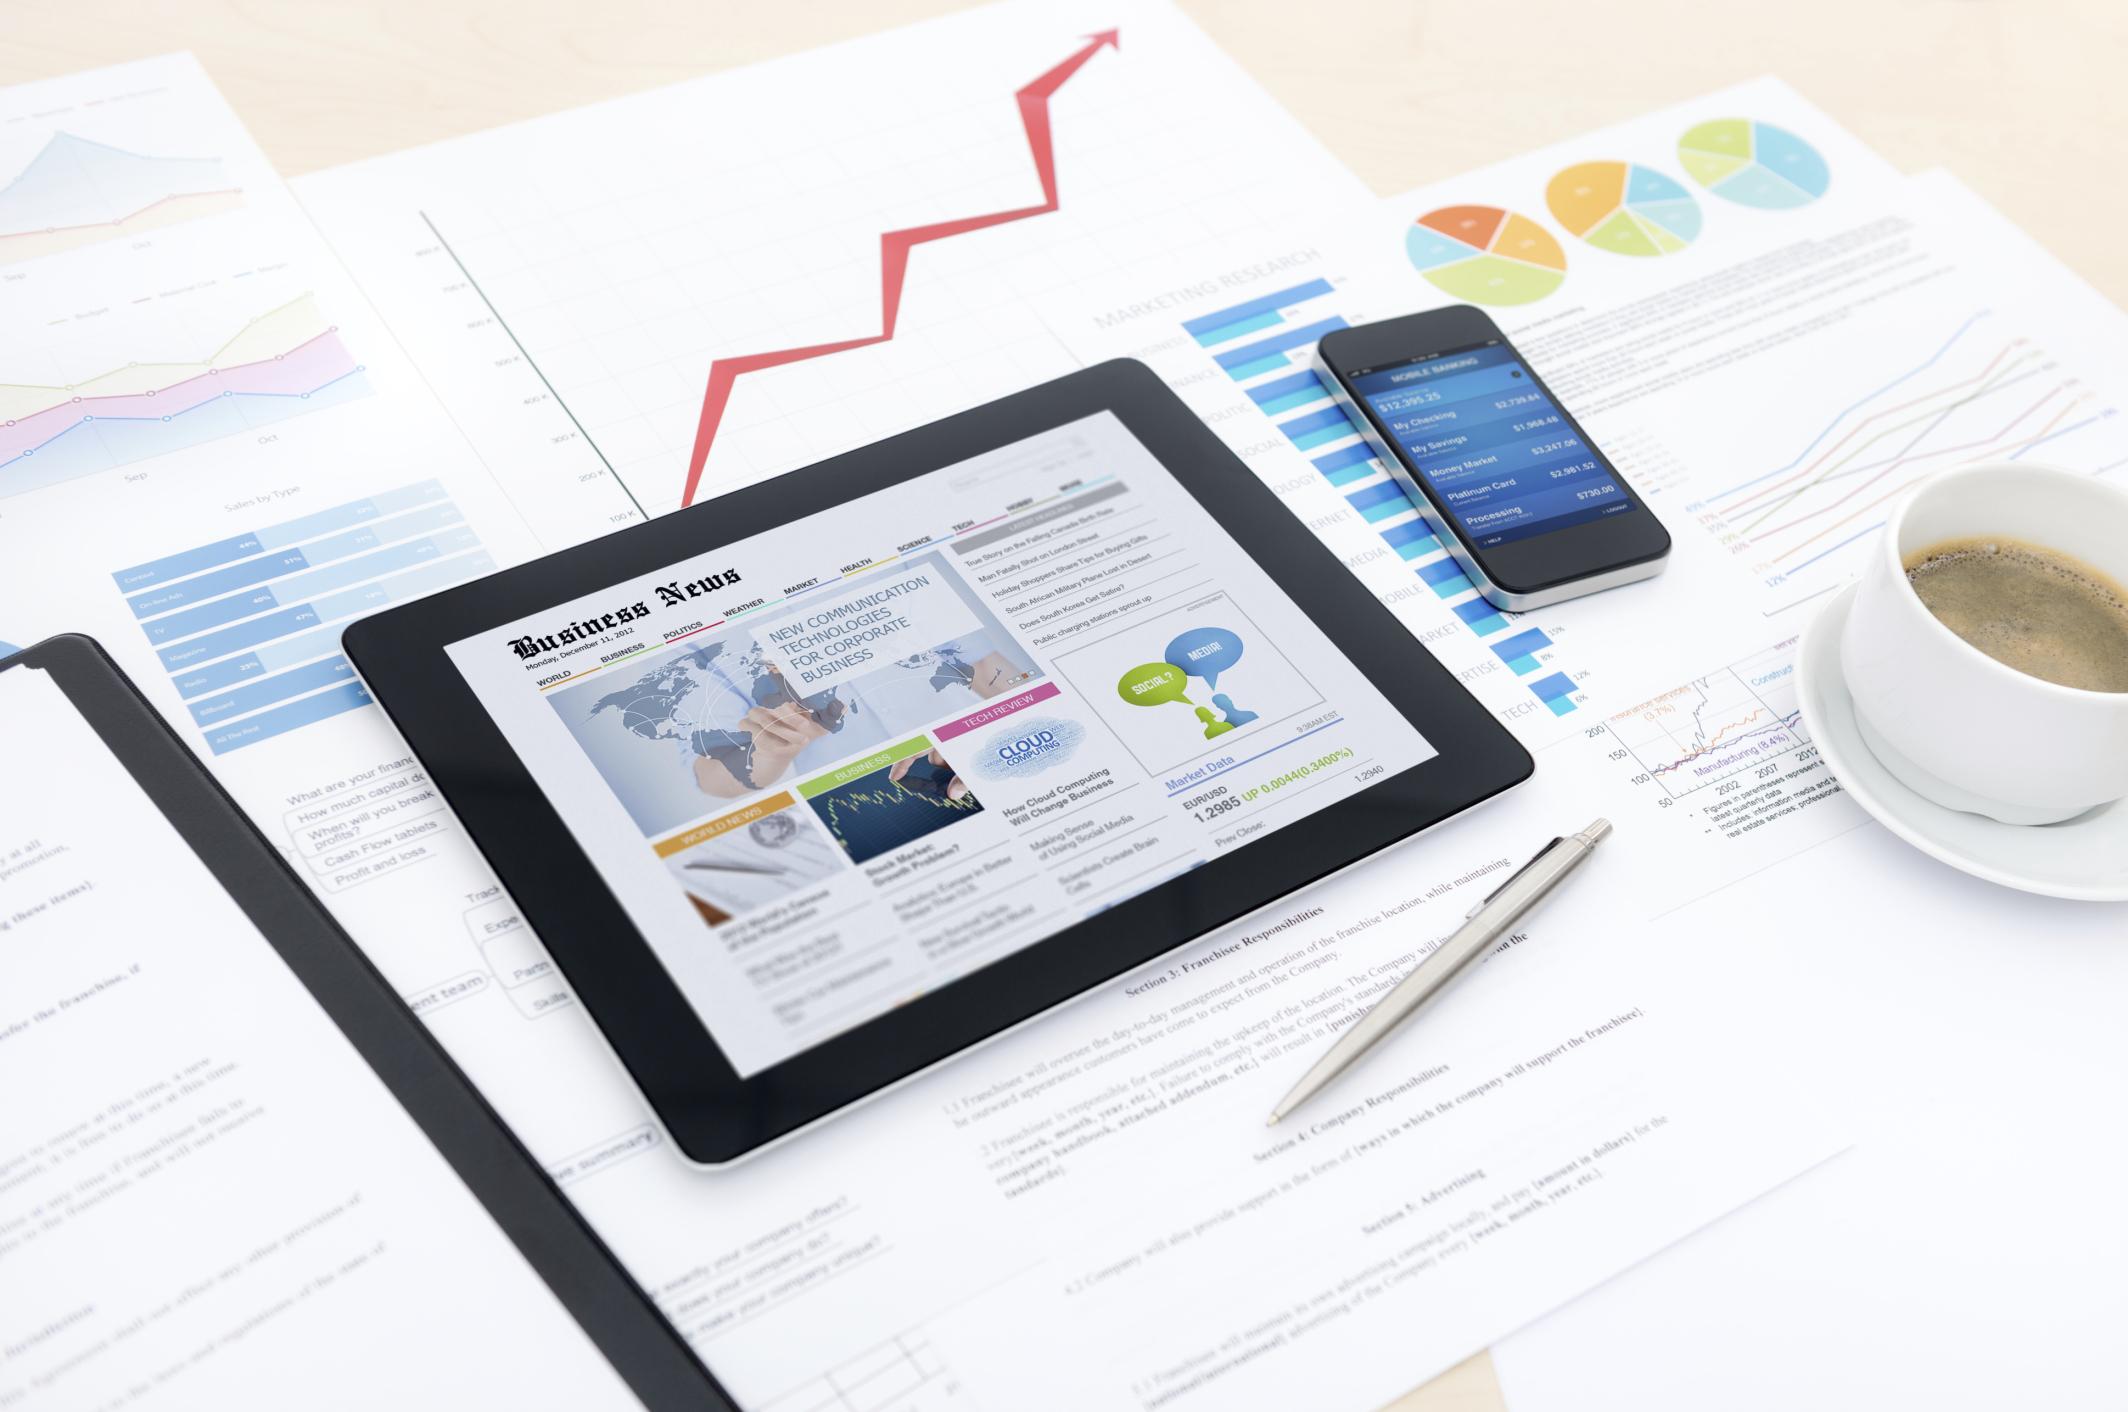 10 Ways Modern Enterprise Performance Management Changed Businesses